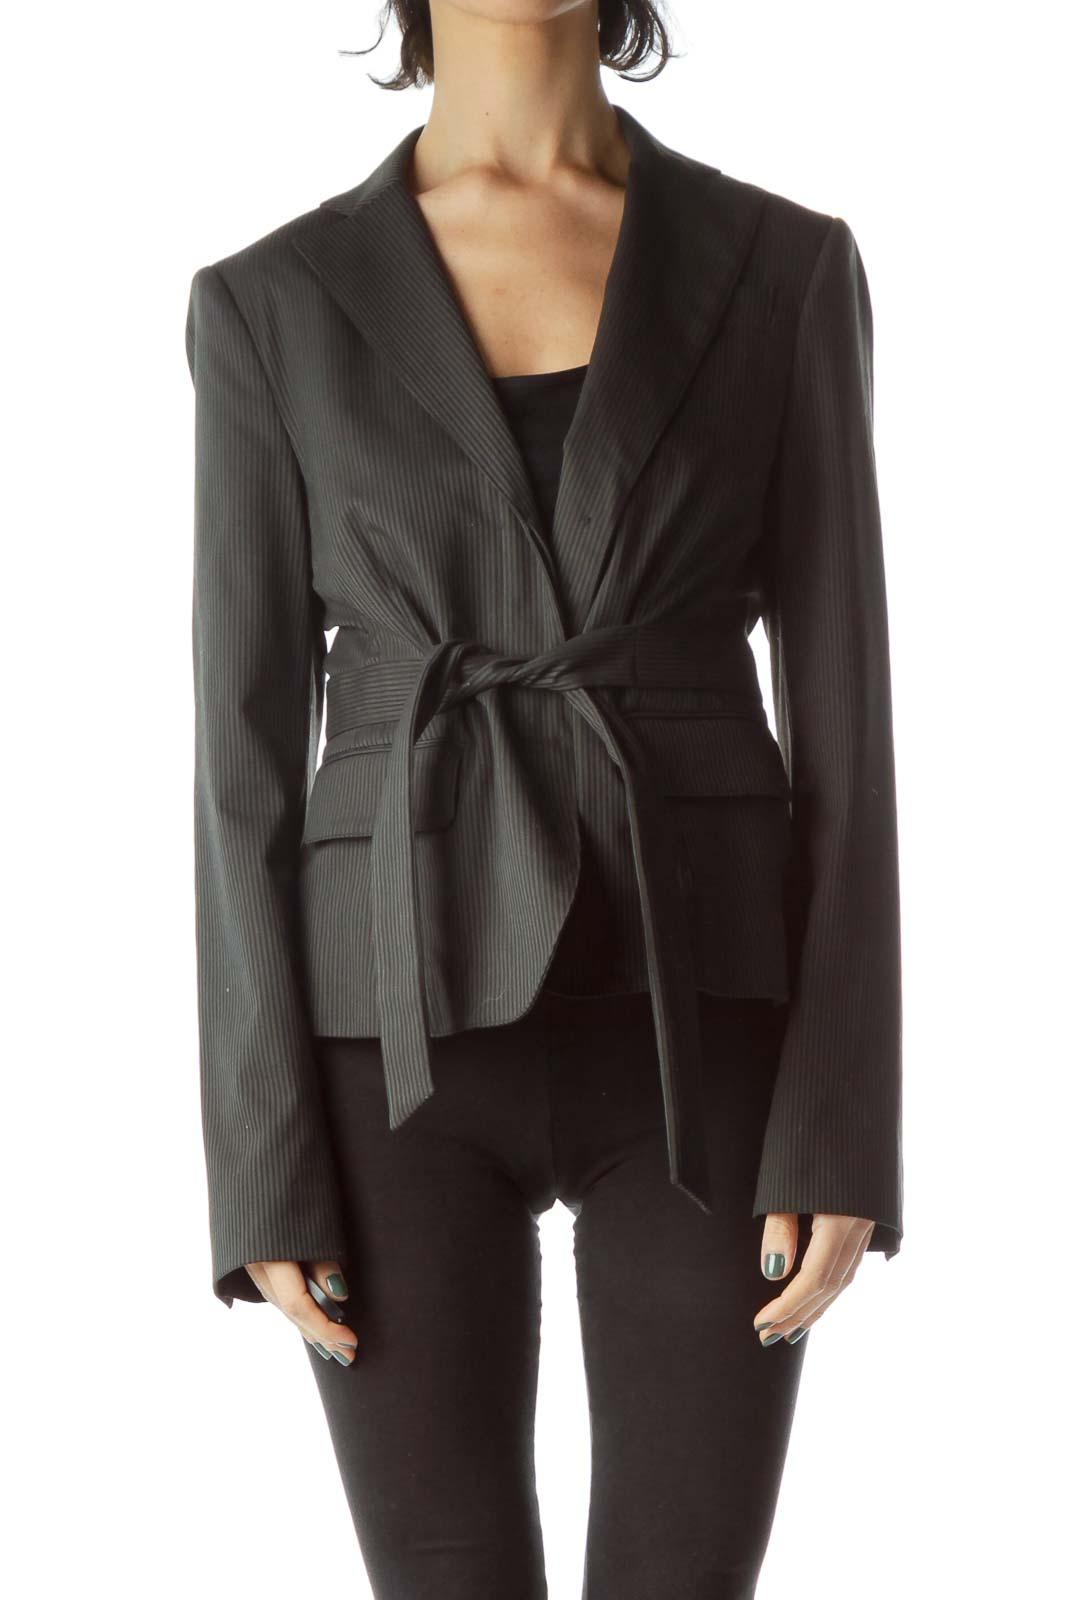 Gray Black Pinstripe Blazer with Tie